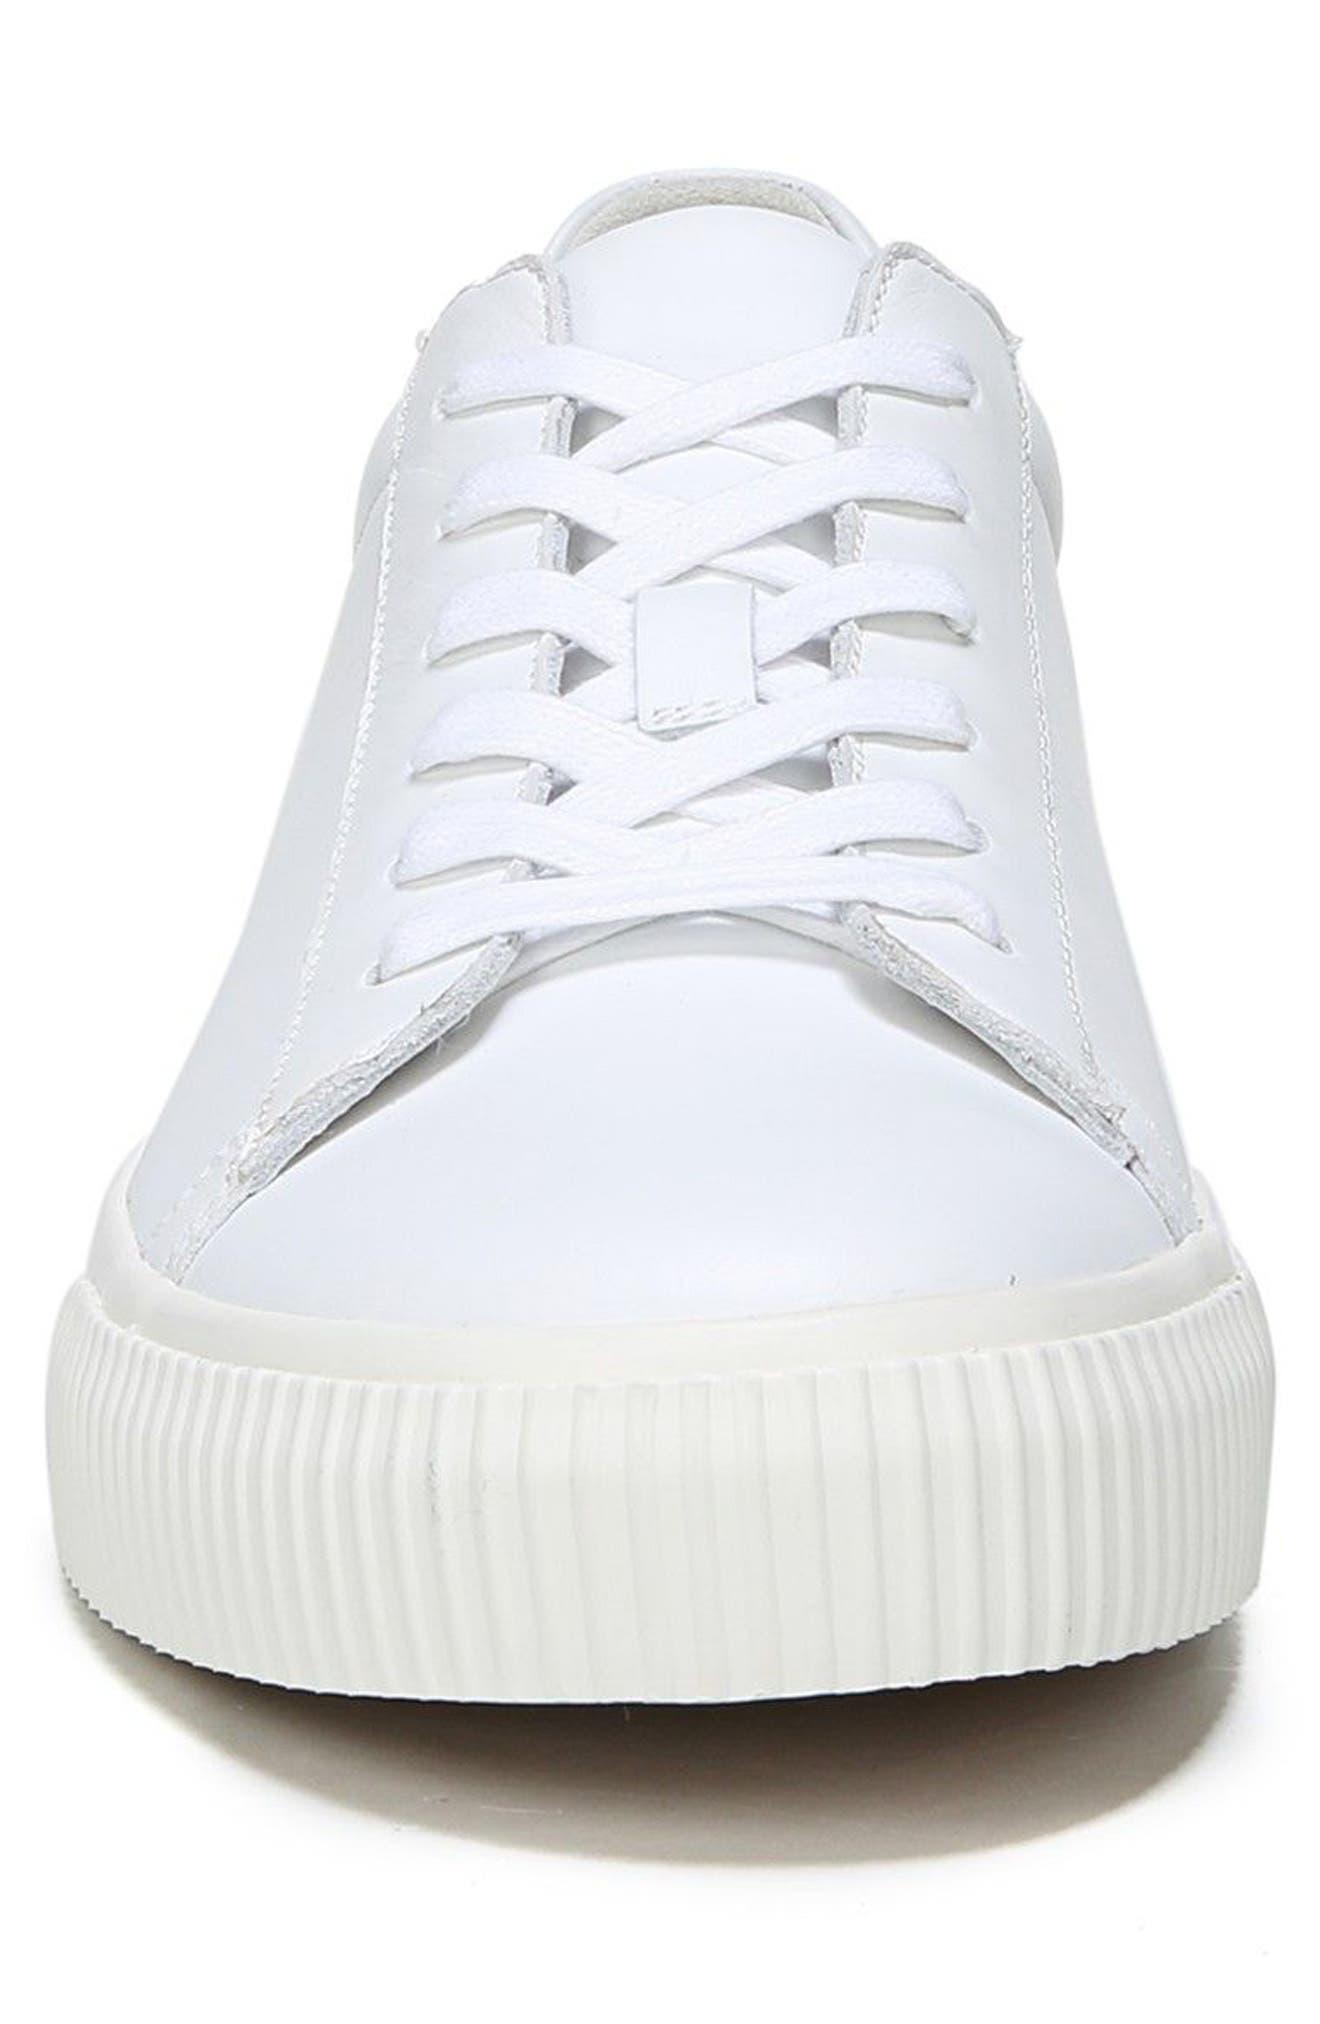 Kurtis Low Top Sneaker,                             Alternate thumbnail 4, color,                             White